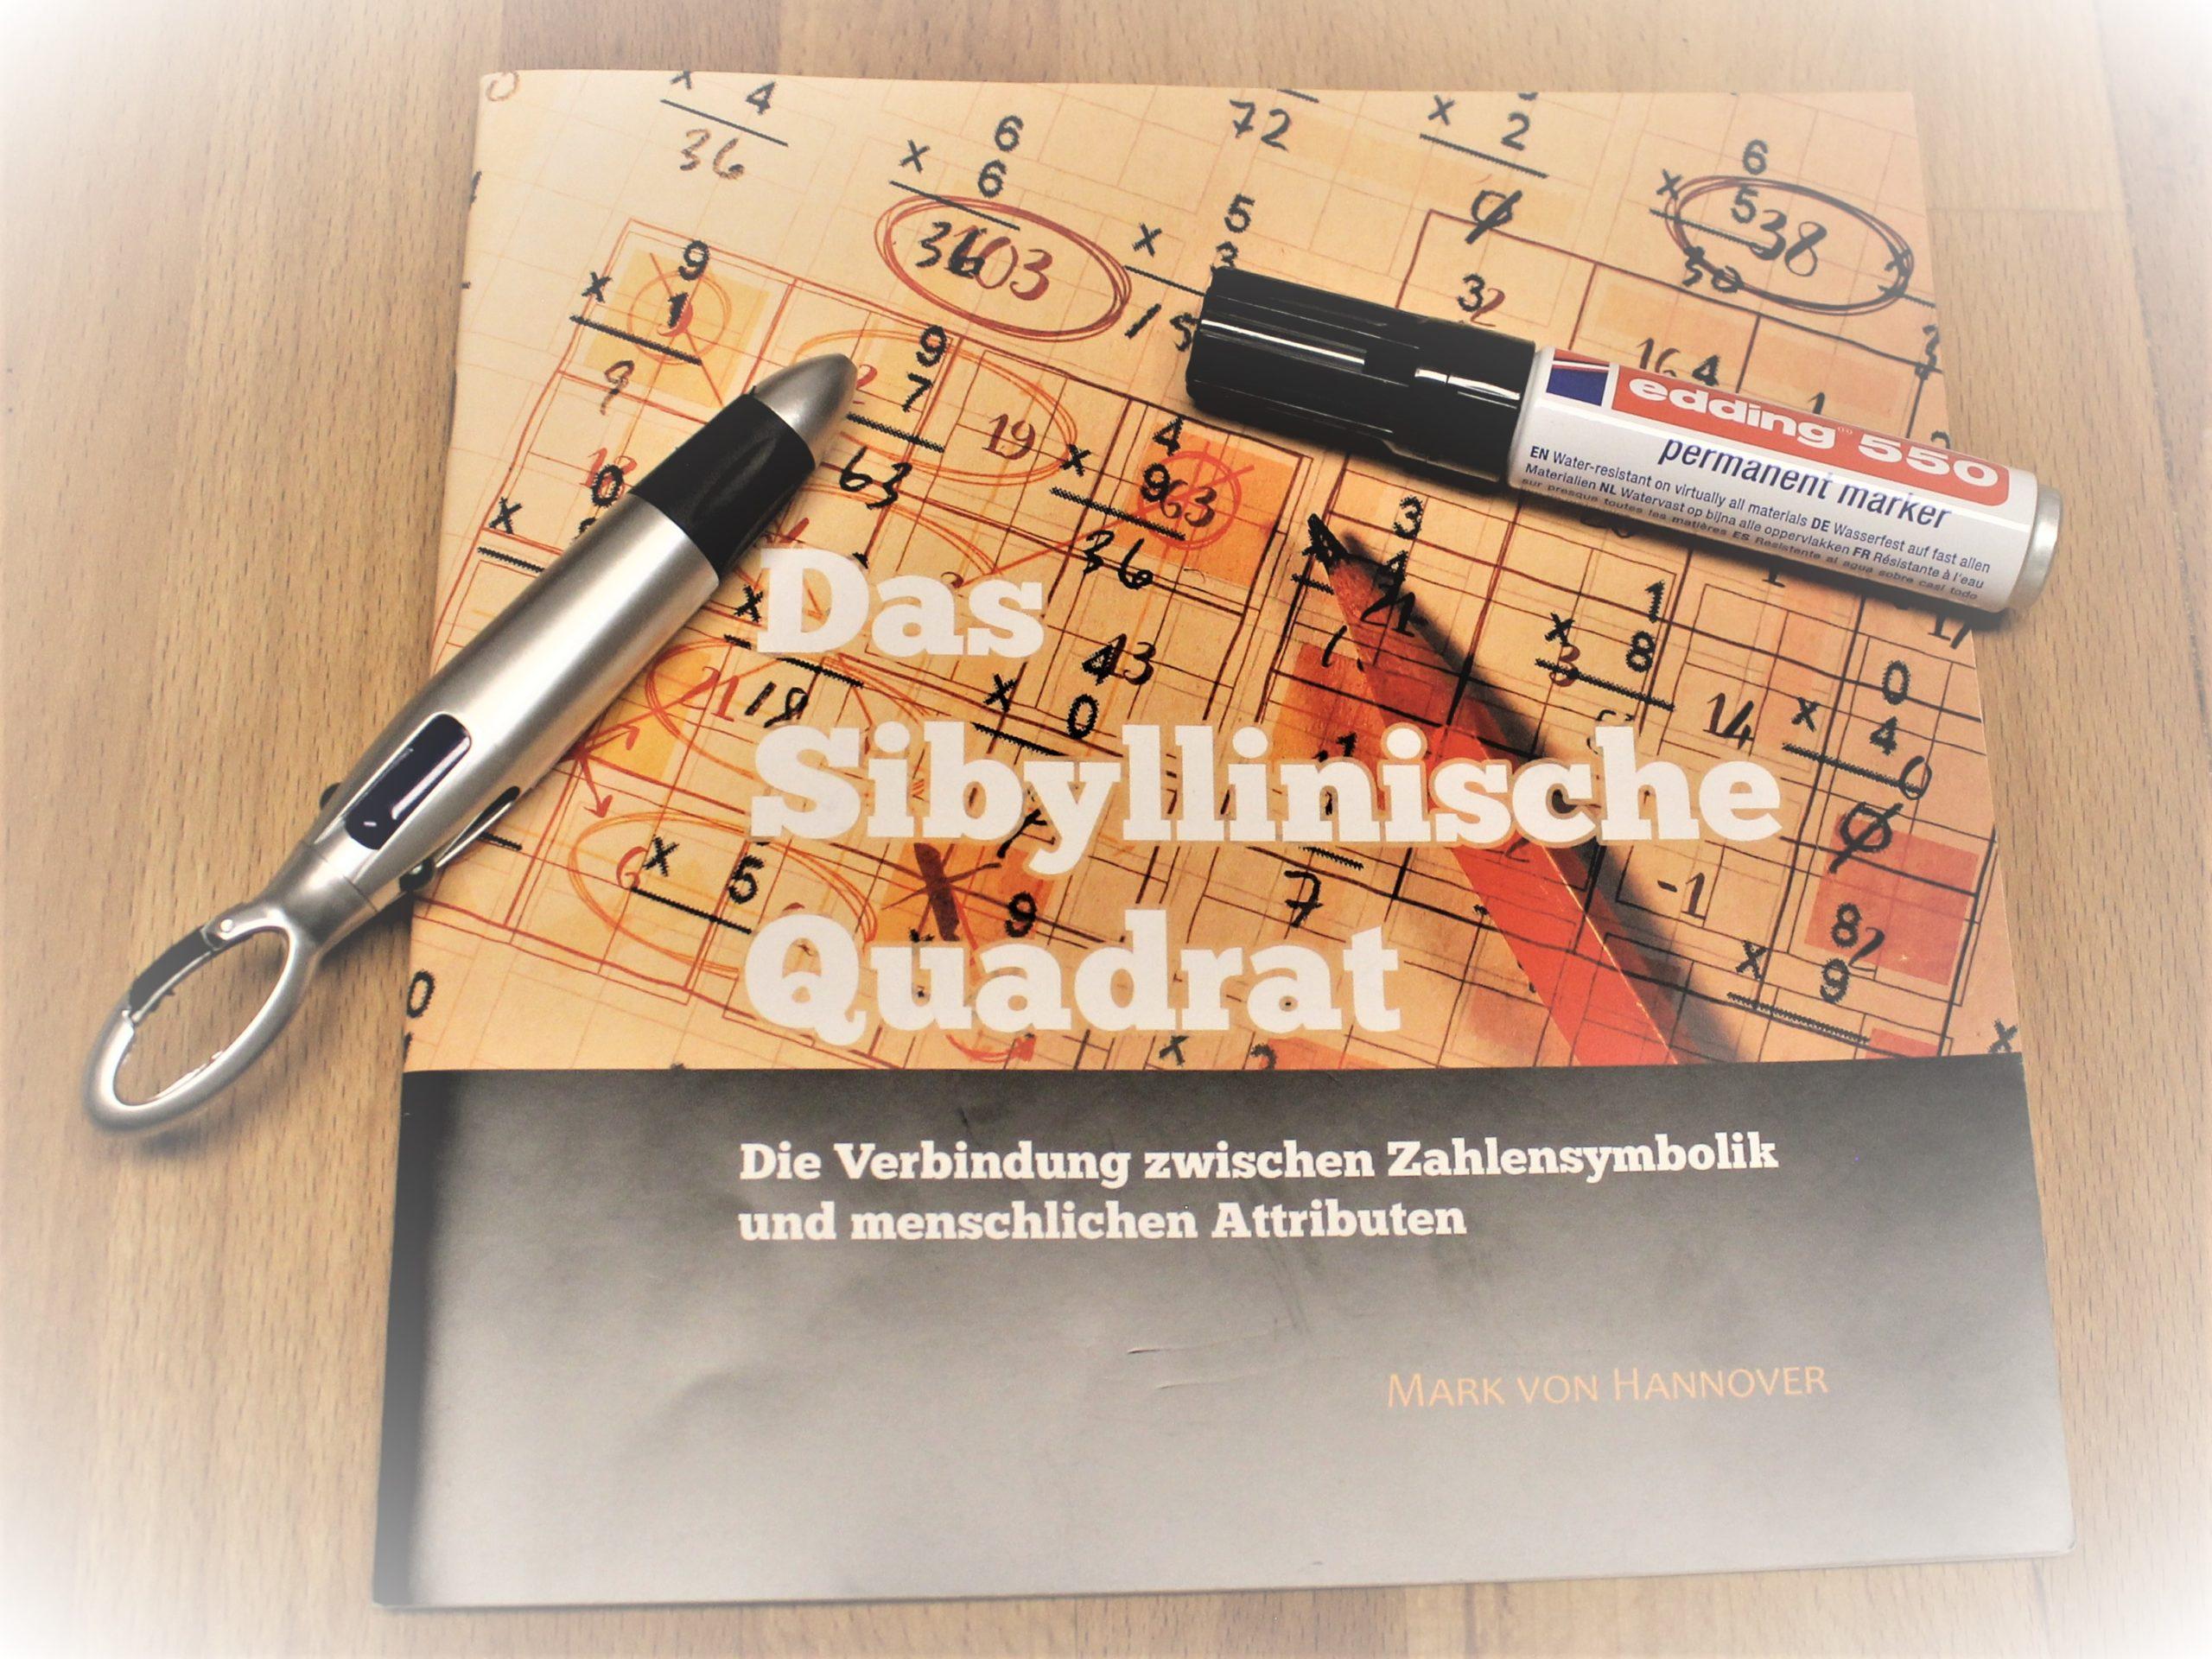 Das Sibyllinische Quadrat – Mentalmagie  – Review